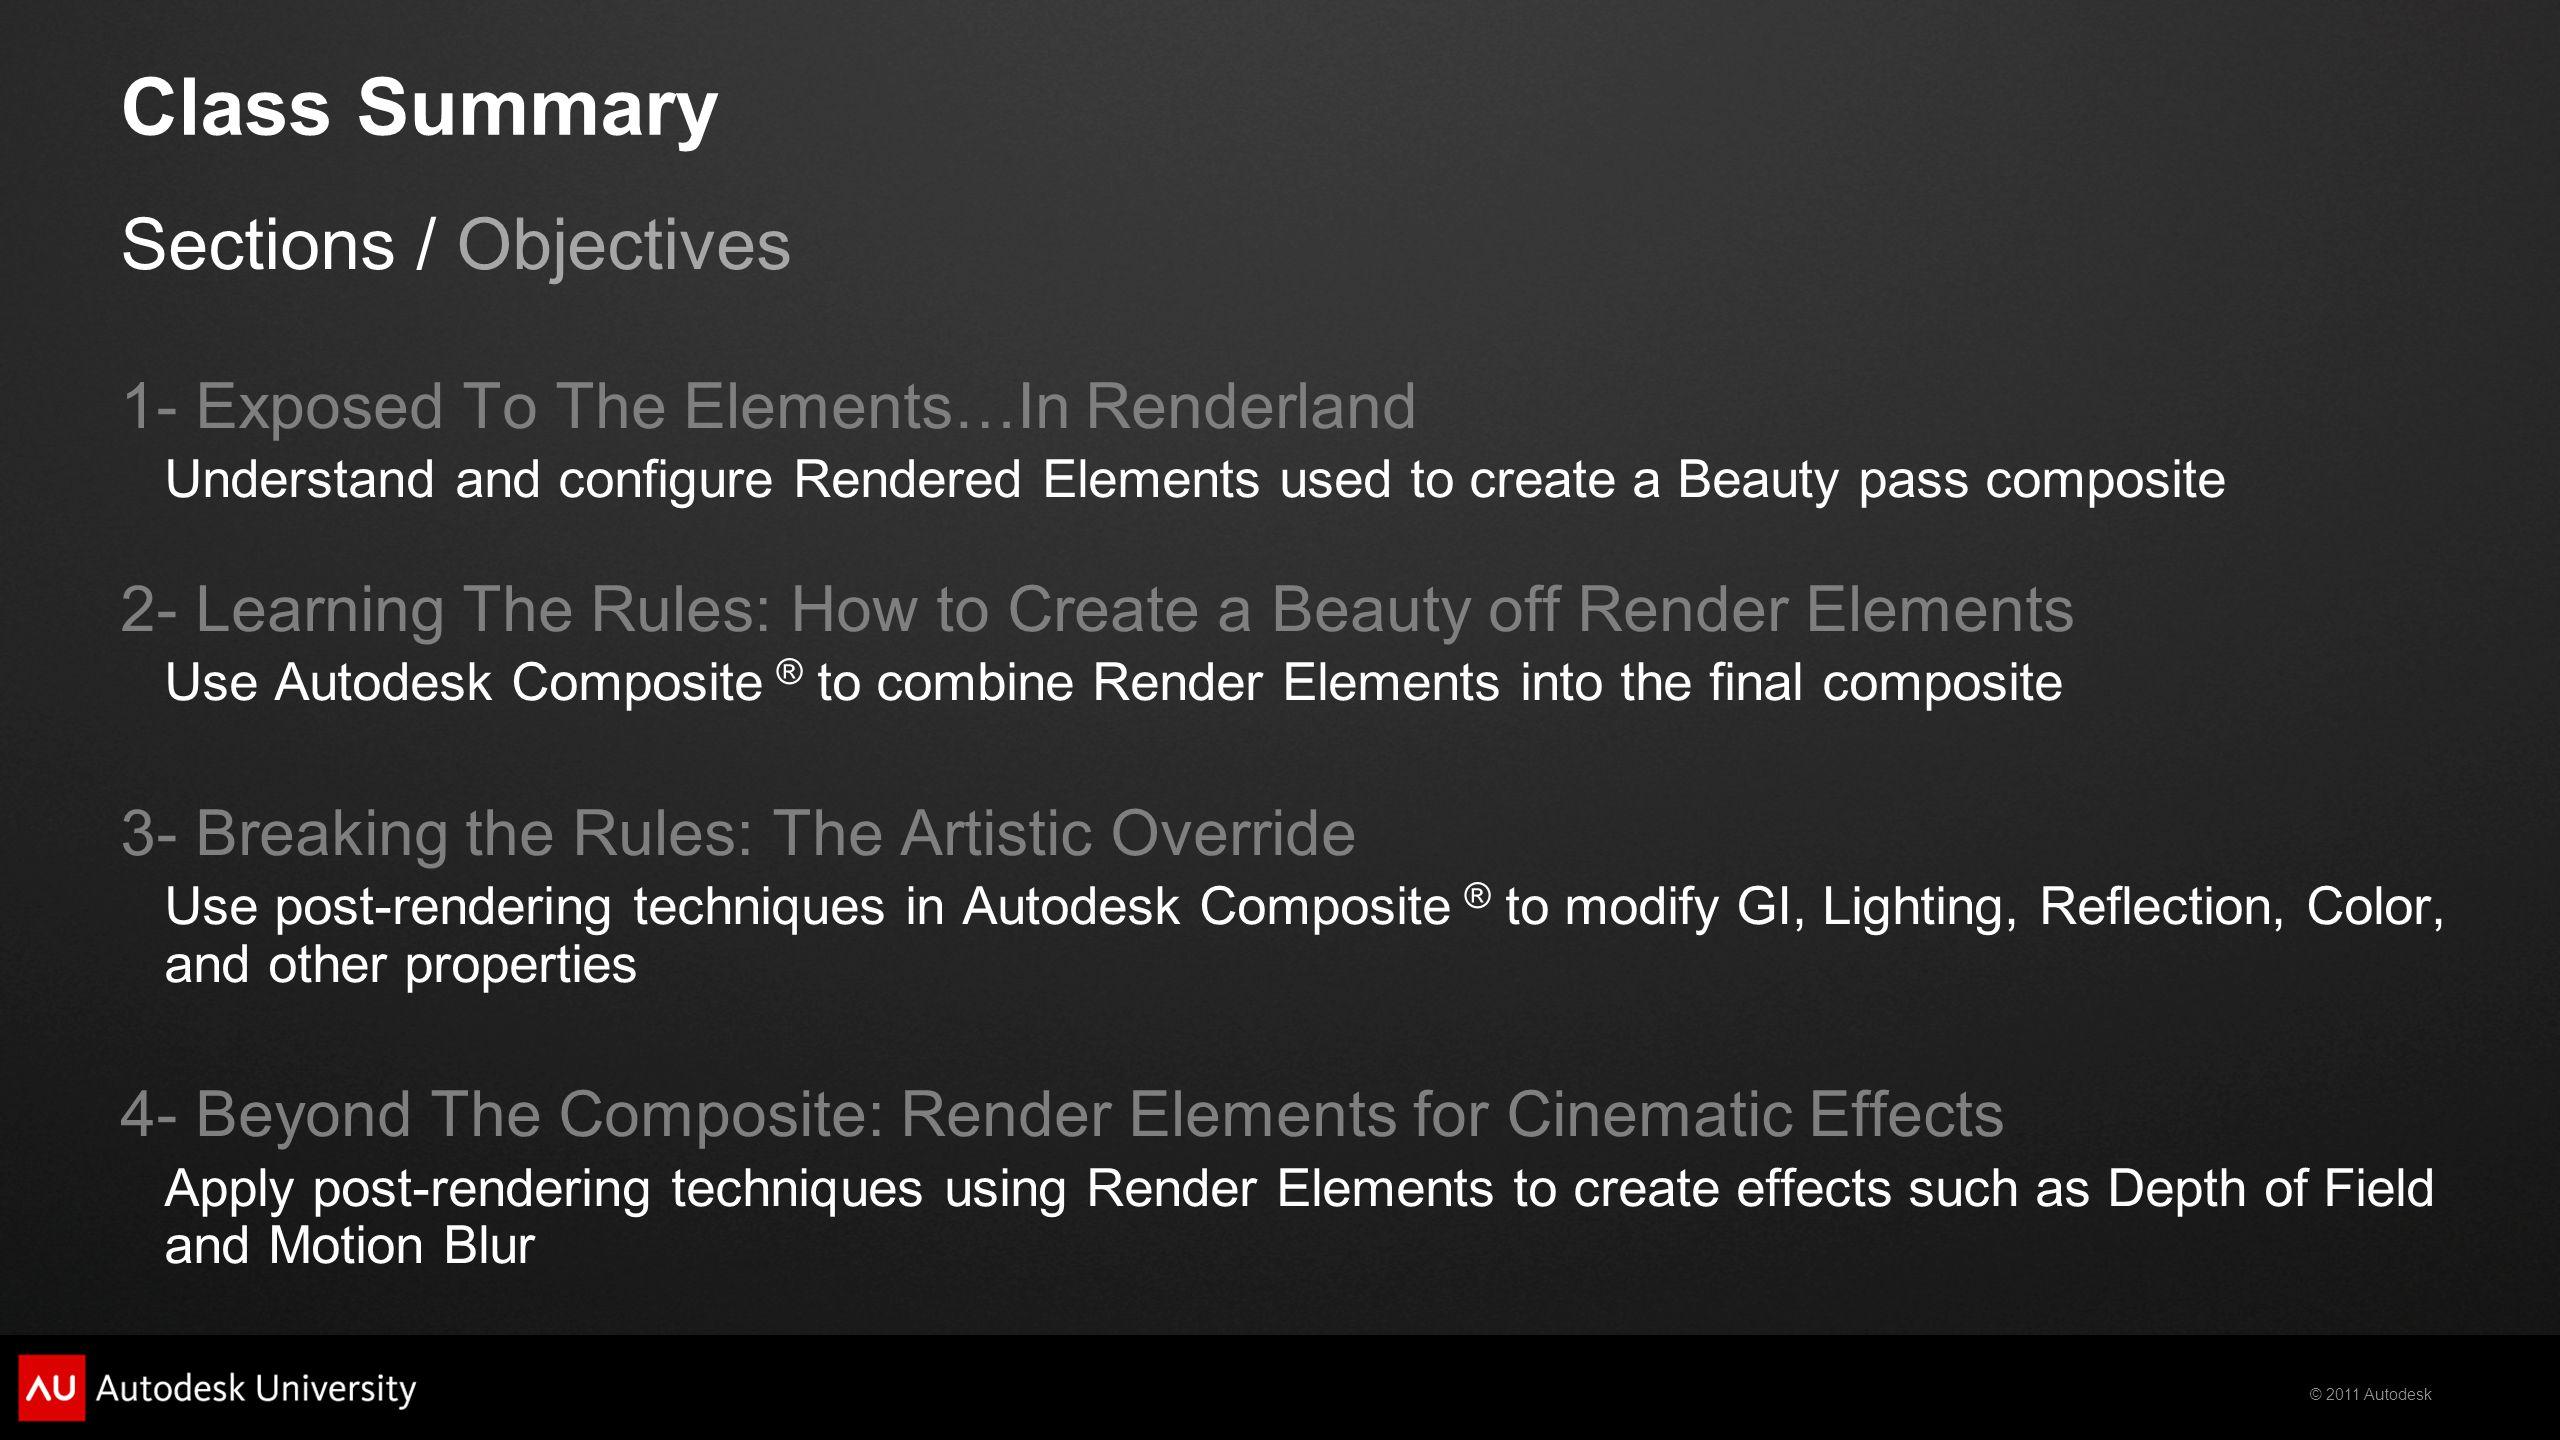 © 2011 Autodesk Diffuse Filter Raw Lighting Lighting Diffuse Filter Raw Lighting Lighting Lighting